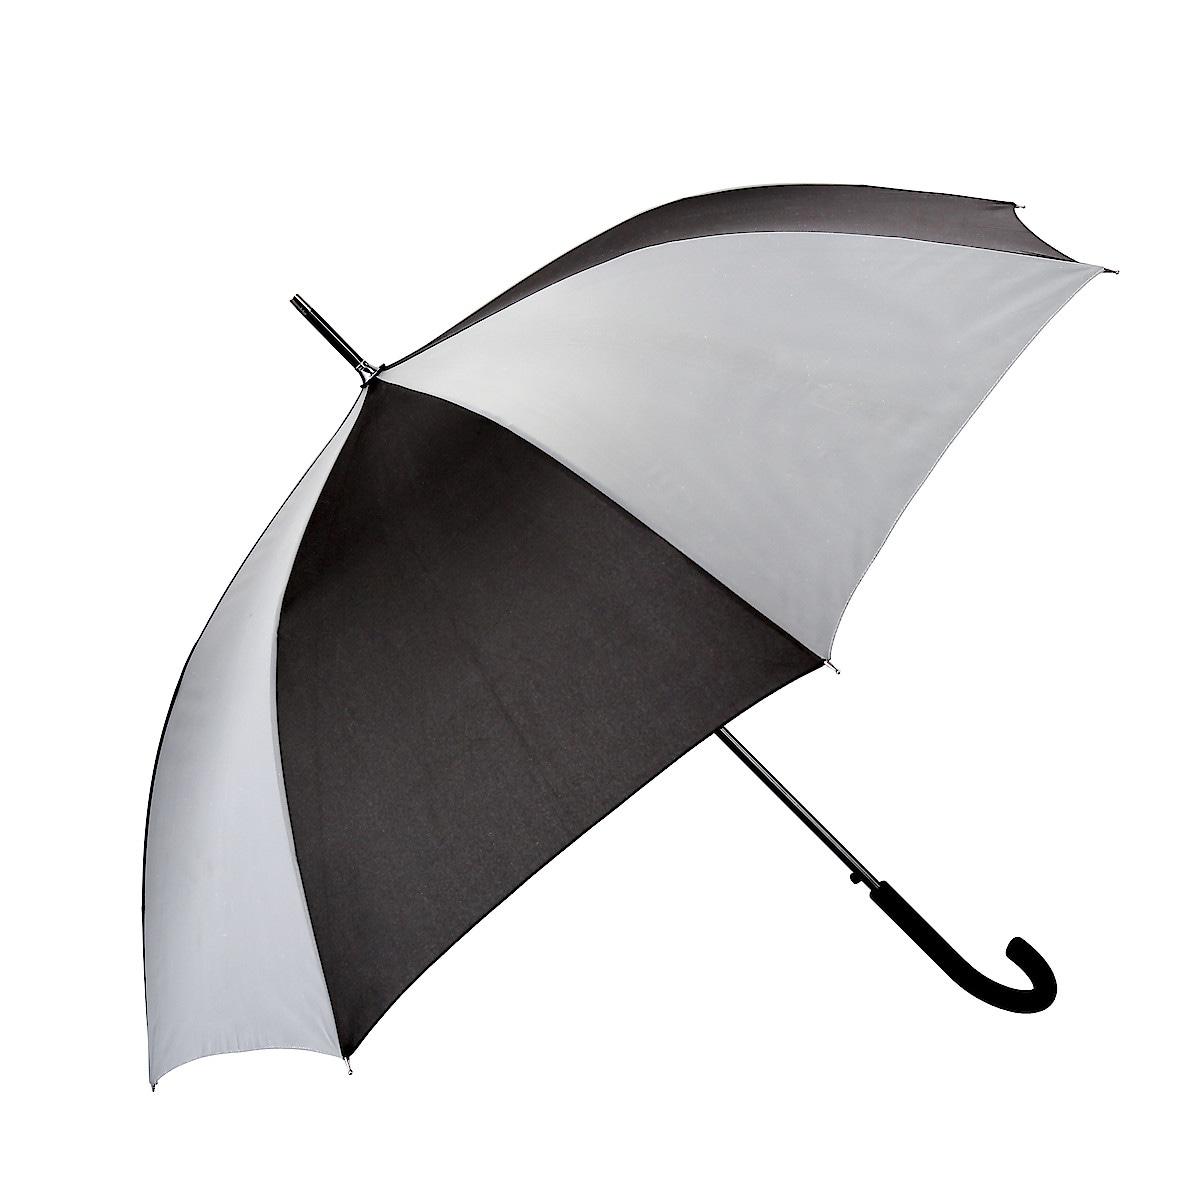 Asaklitt 100 cm Reflective Umbrella